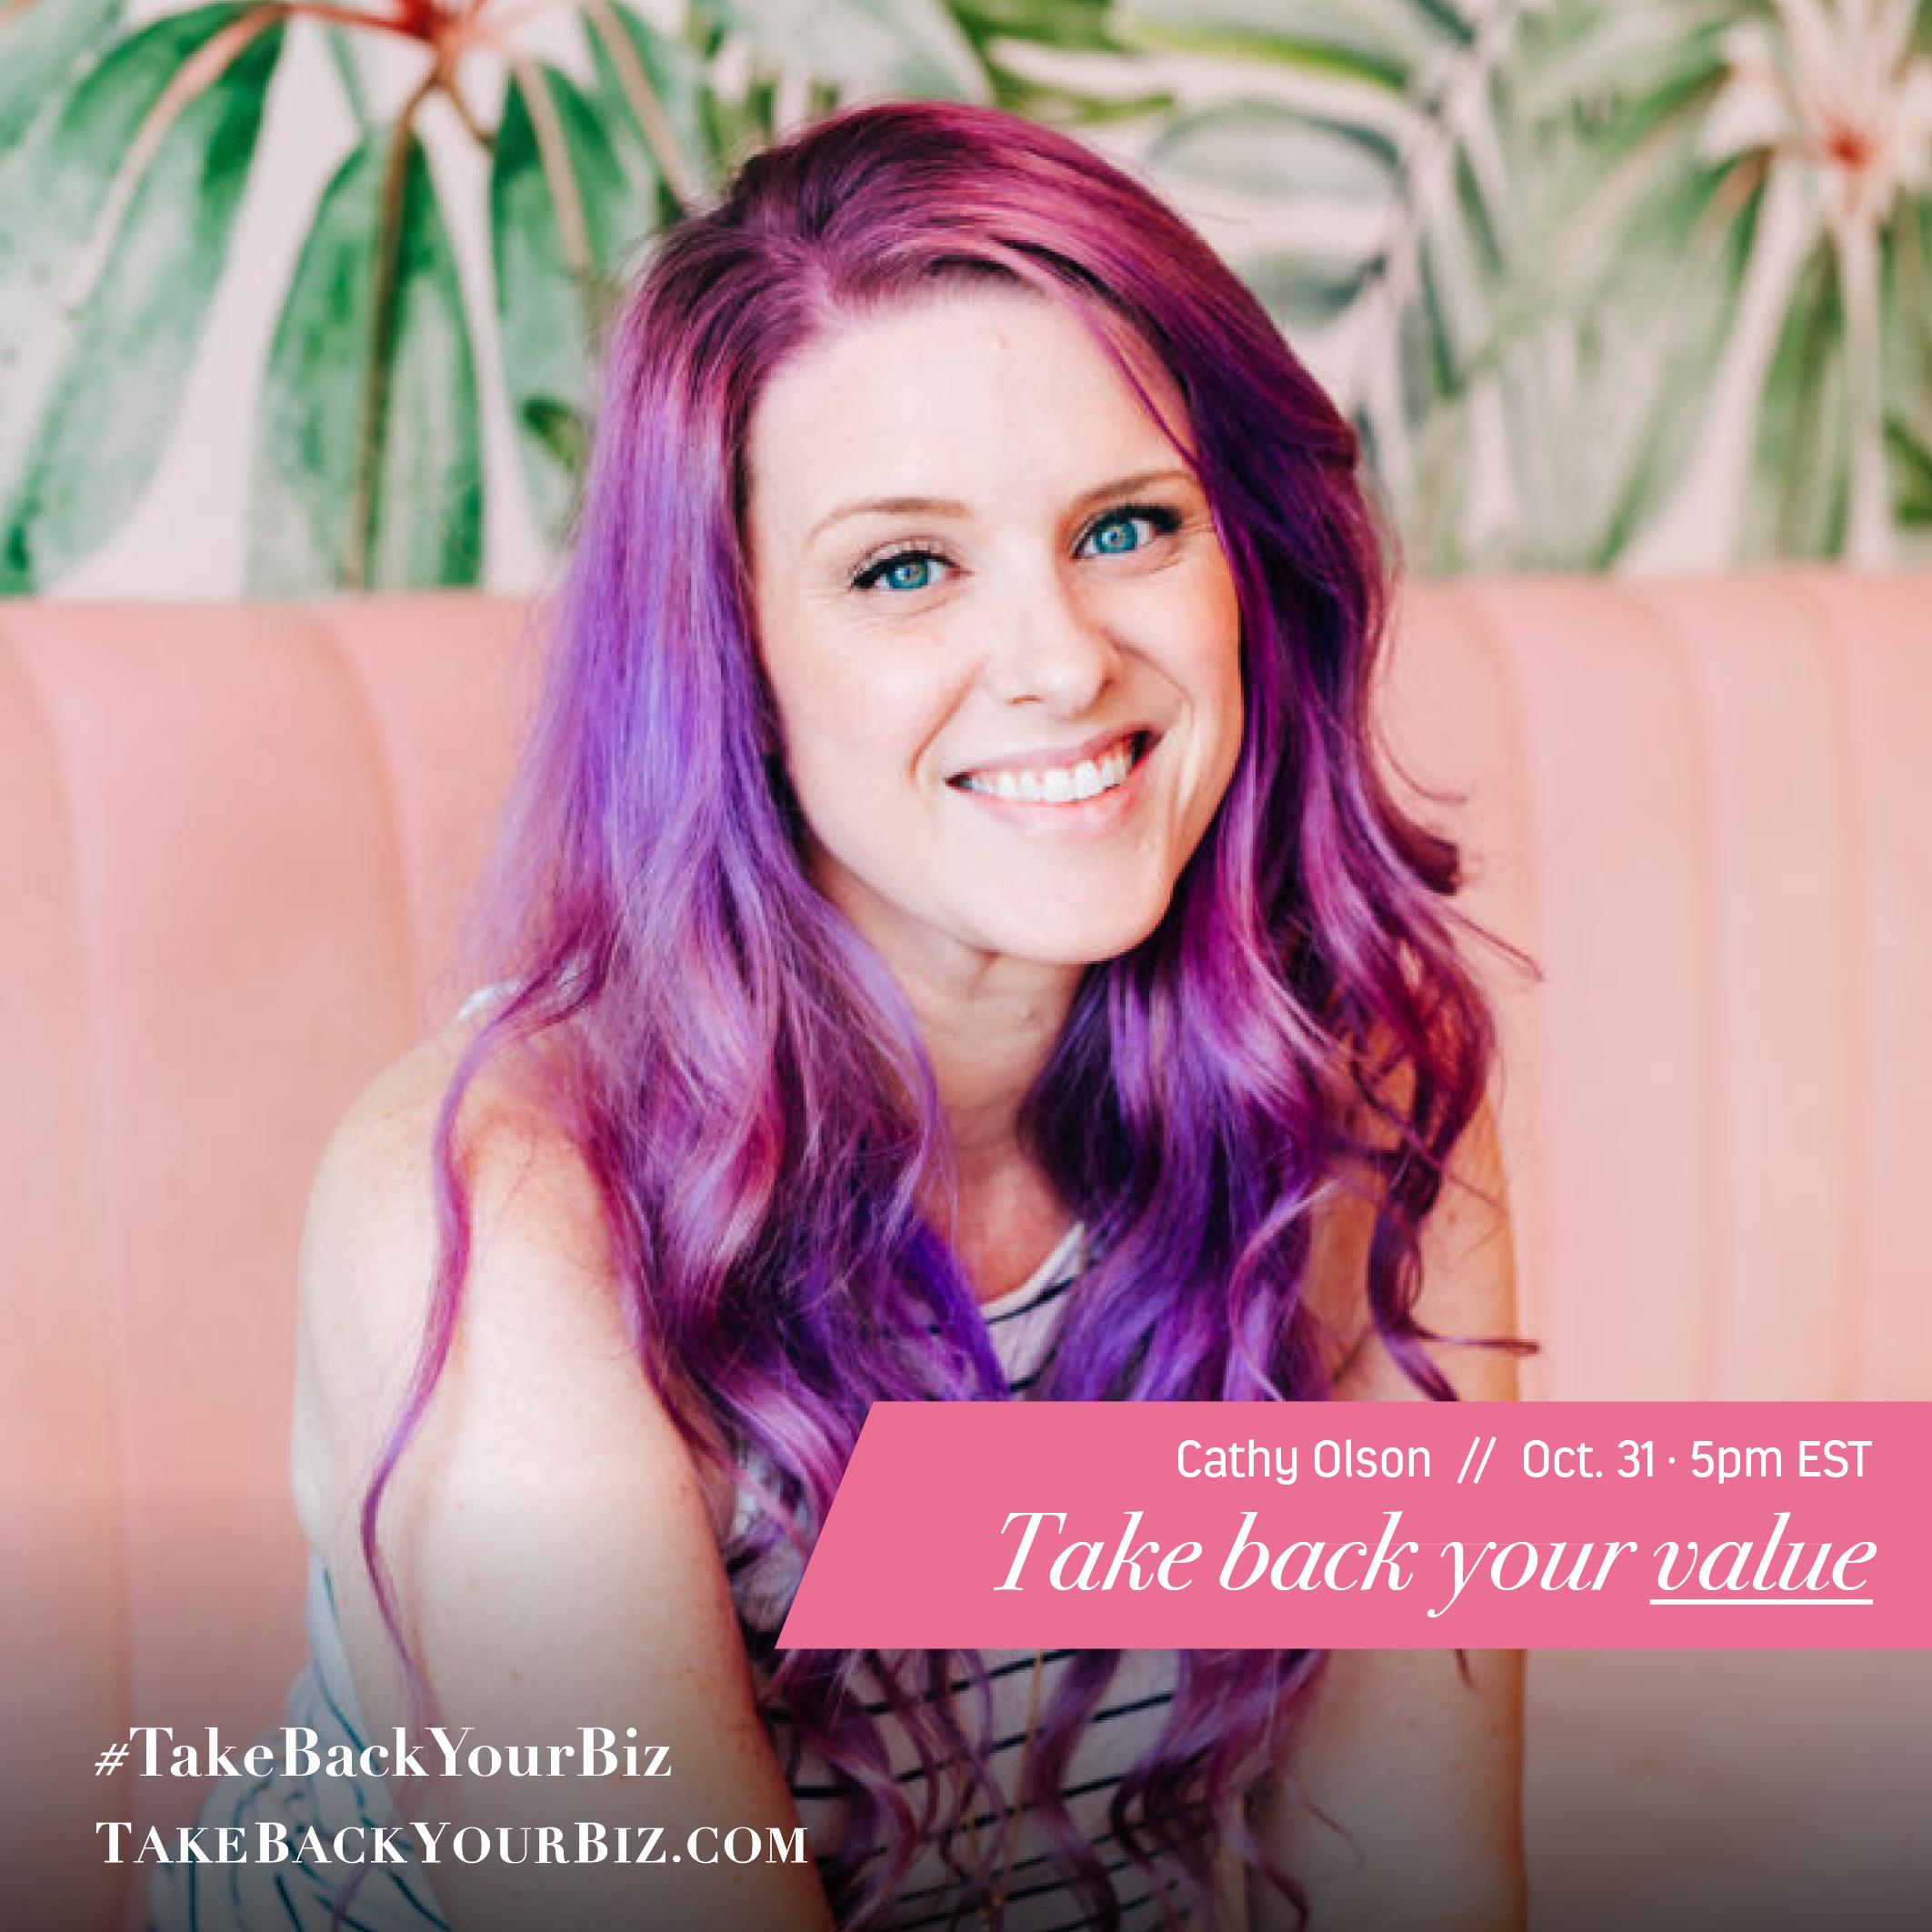 Take-Back-Your-Biz-Speakers-Cathy-Olson-Love-Inspired